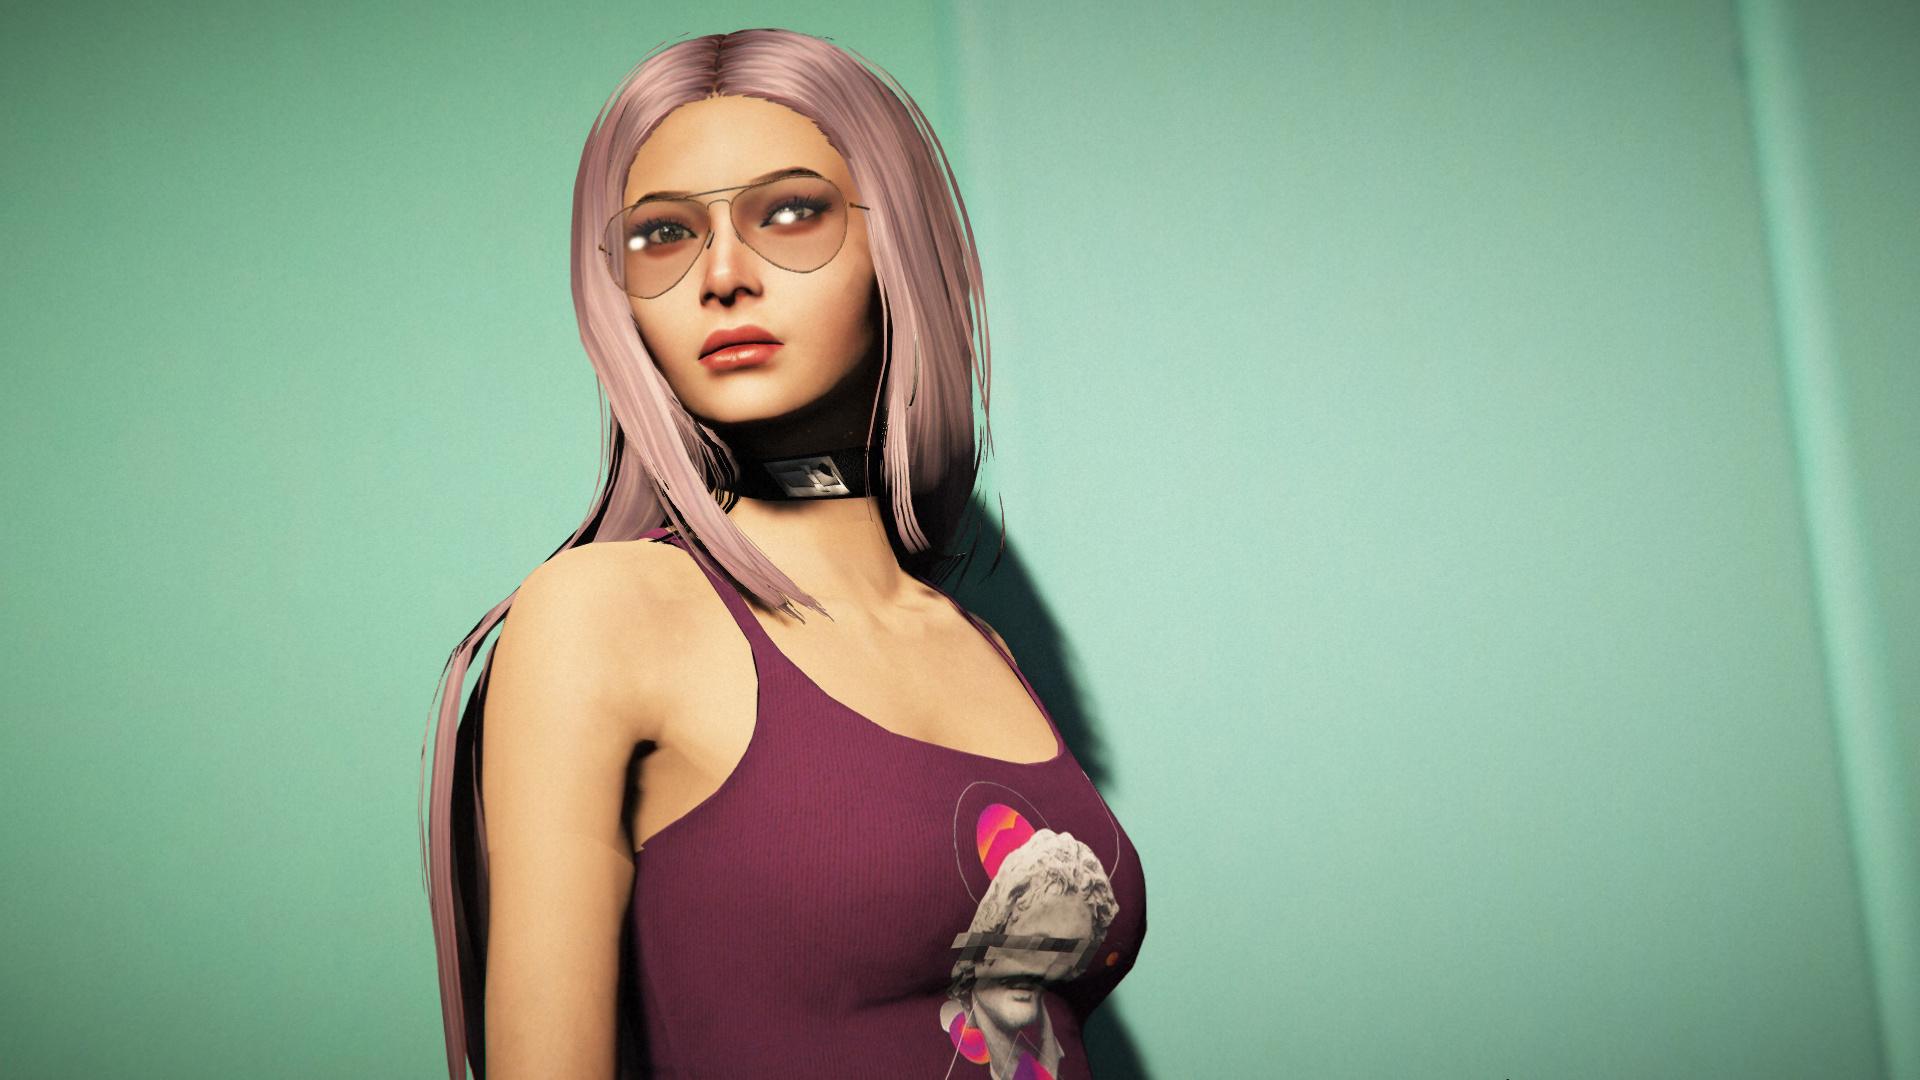 Ada Wong - Resident Evil 4 by BeataVargas on DeviantArt